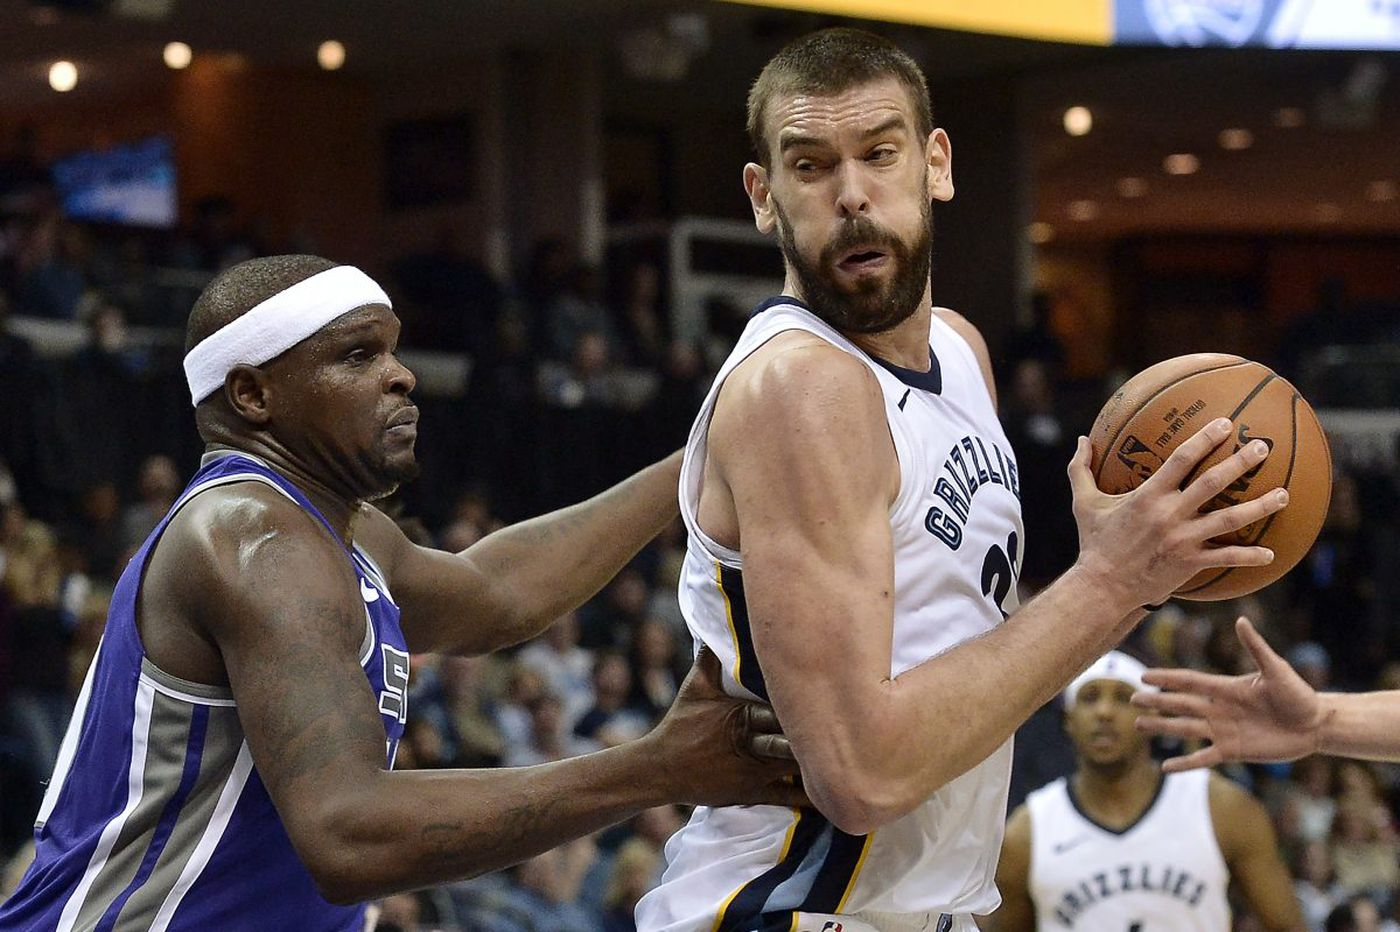 Sixers-Grizzlies preview: Looking to snap Memphis' home winning streak